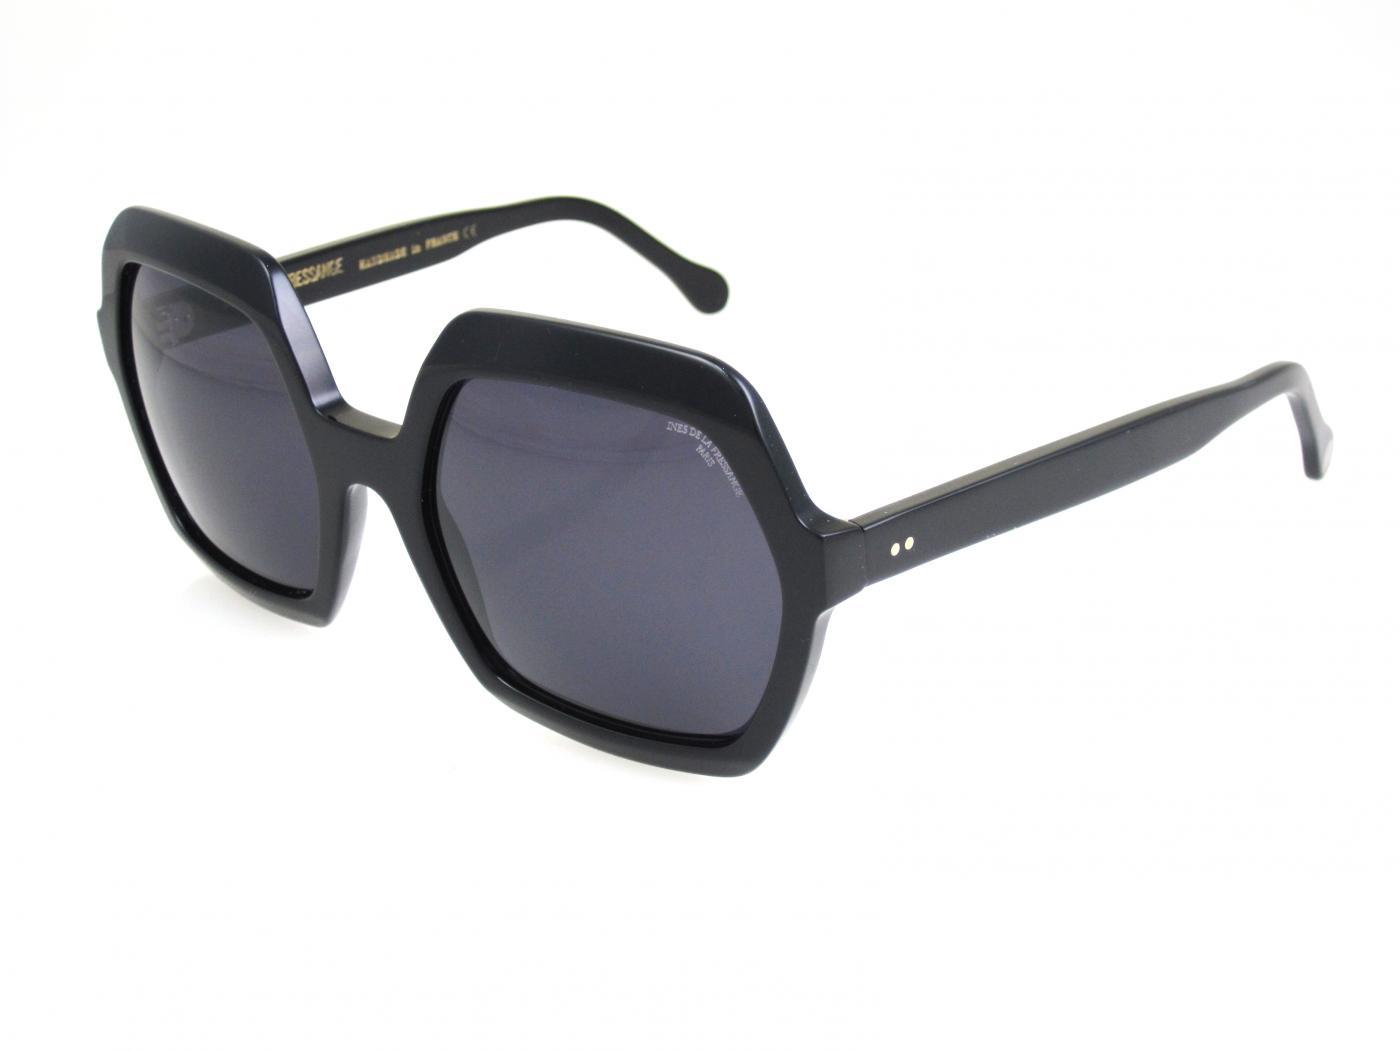 8f36dae8d Dámske slnečné okuliare Ines de la Fressange   oftalens.sk